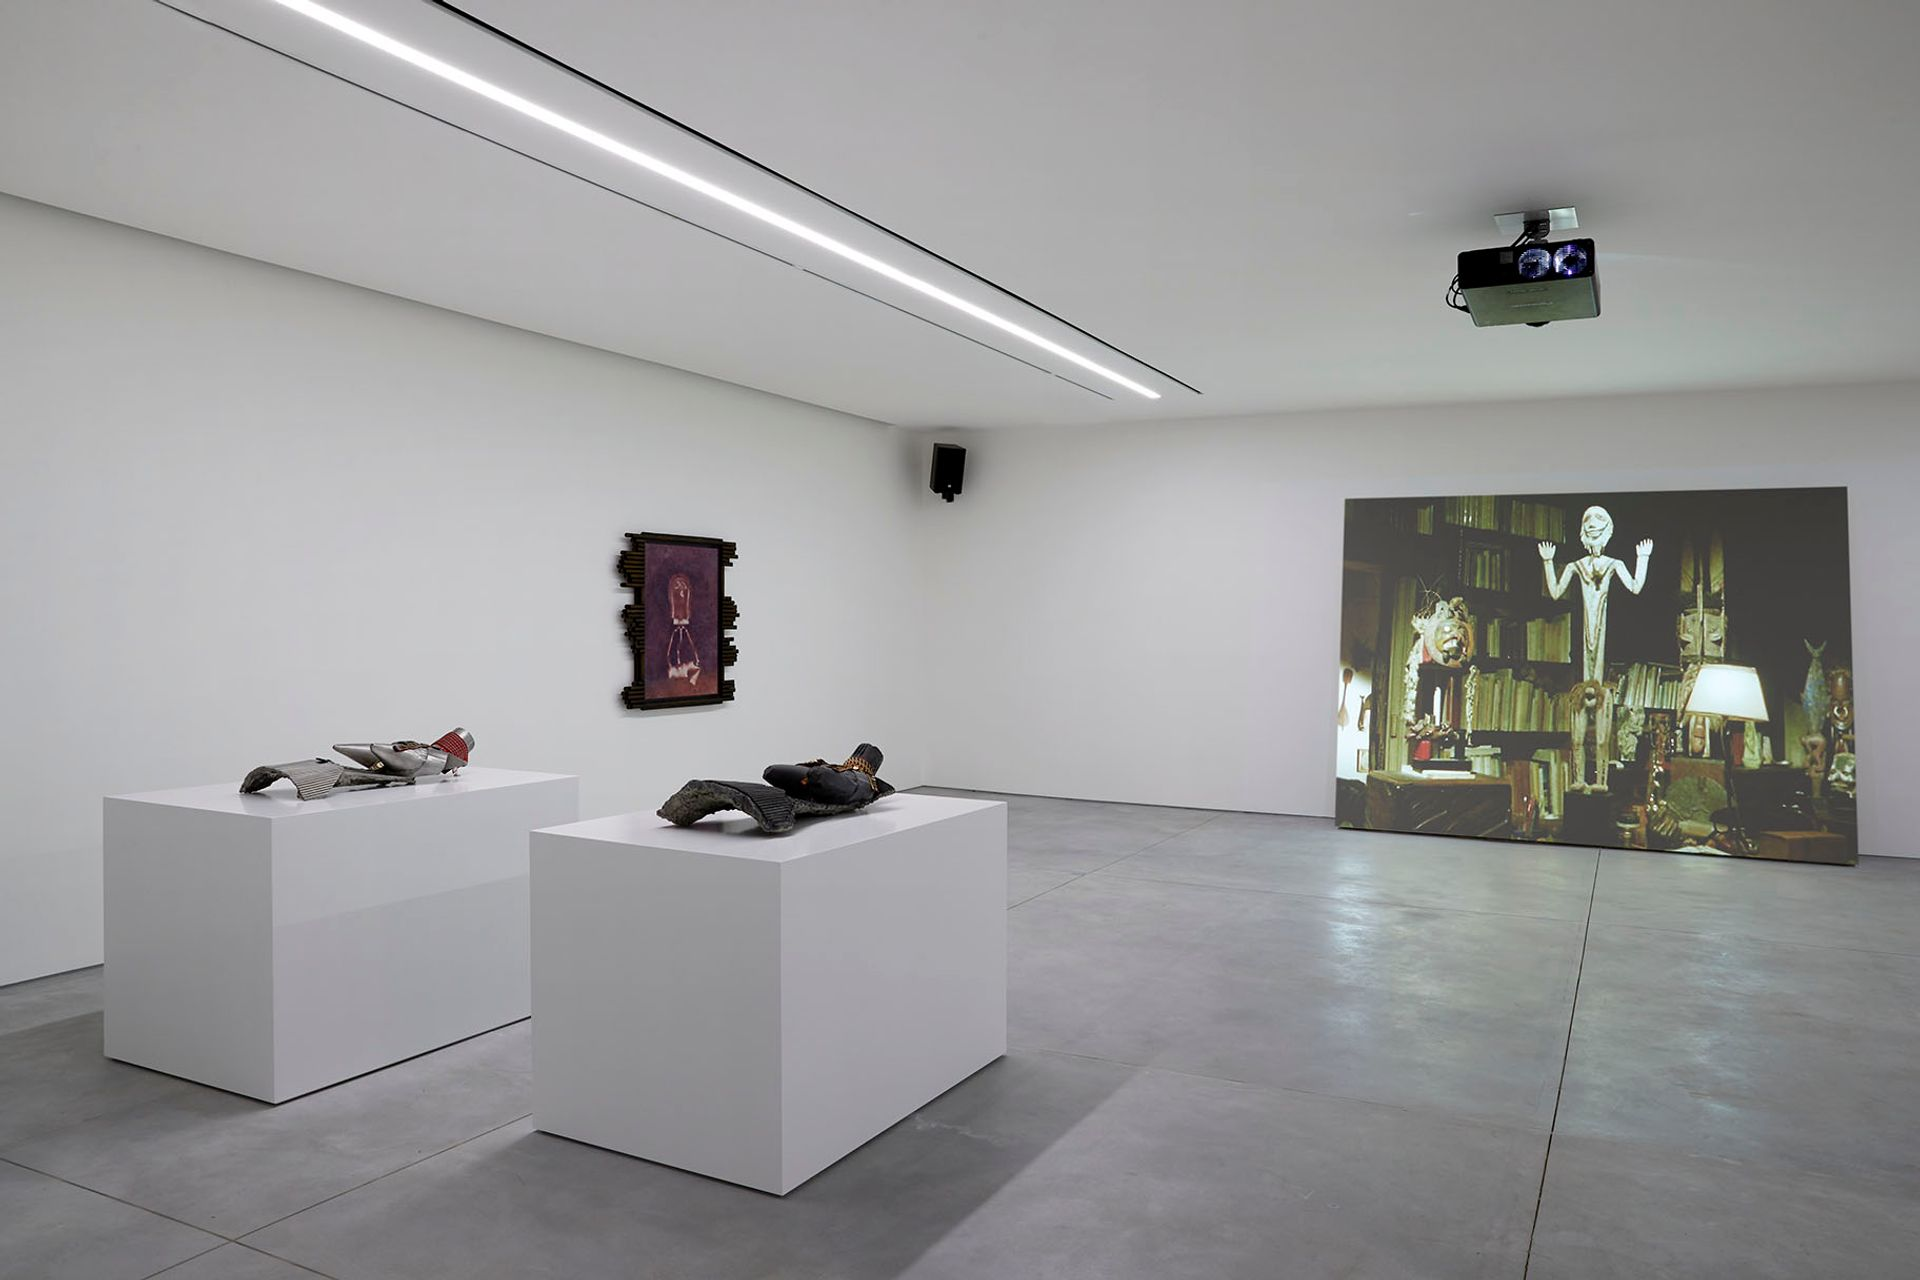 Installation view of Ed Atkins's The Trick Brain (2013) ©Aïshti Foundation. Photo: Guillaume Ziccarelli